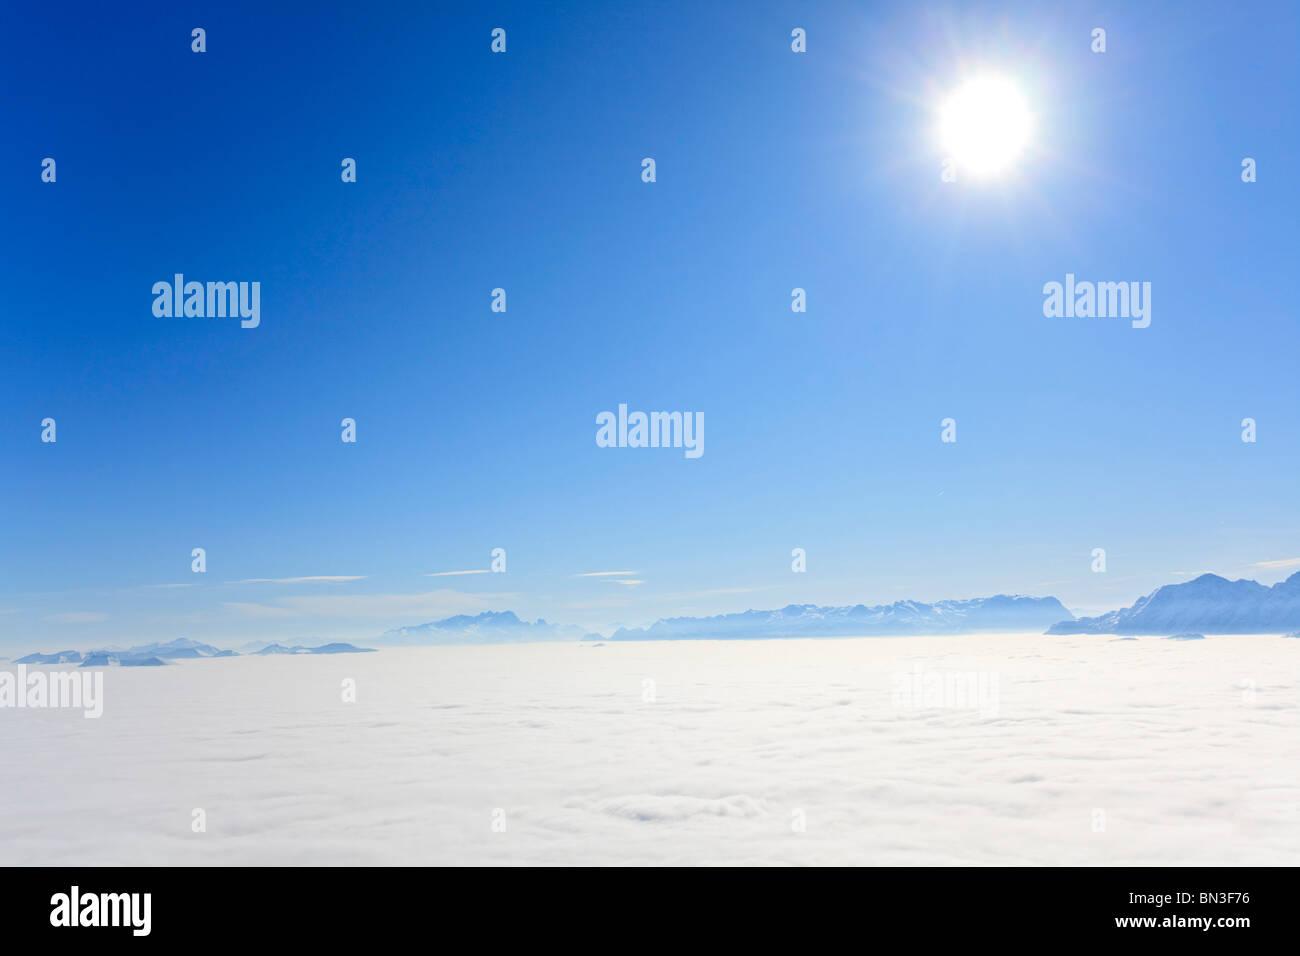 Couvrant le brouillard, Salzachtal Moisl, Autriche Photo Stock